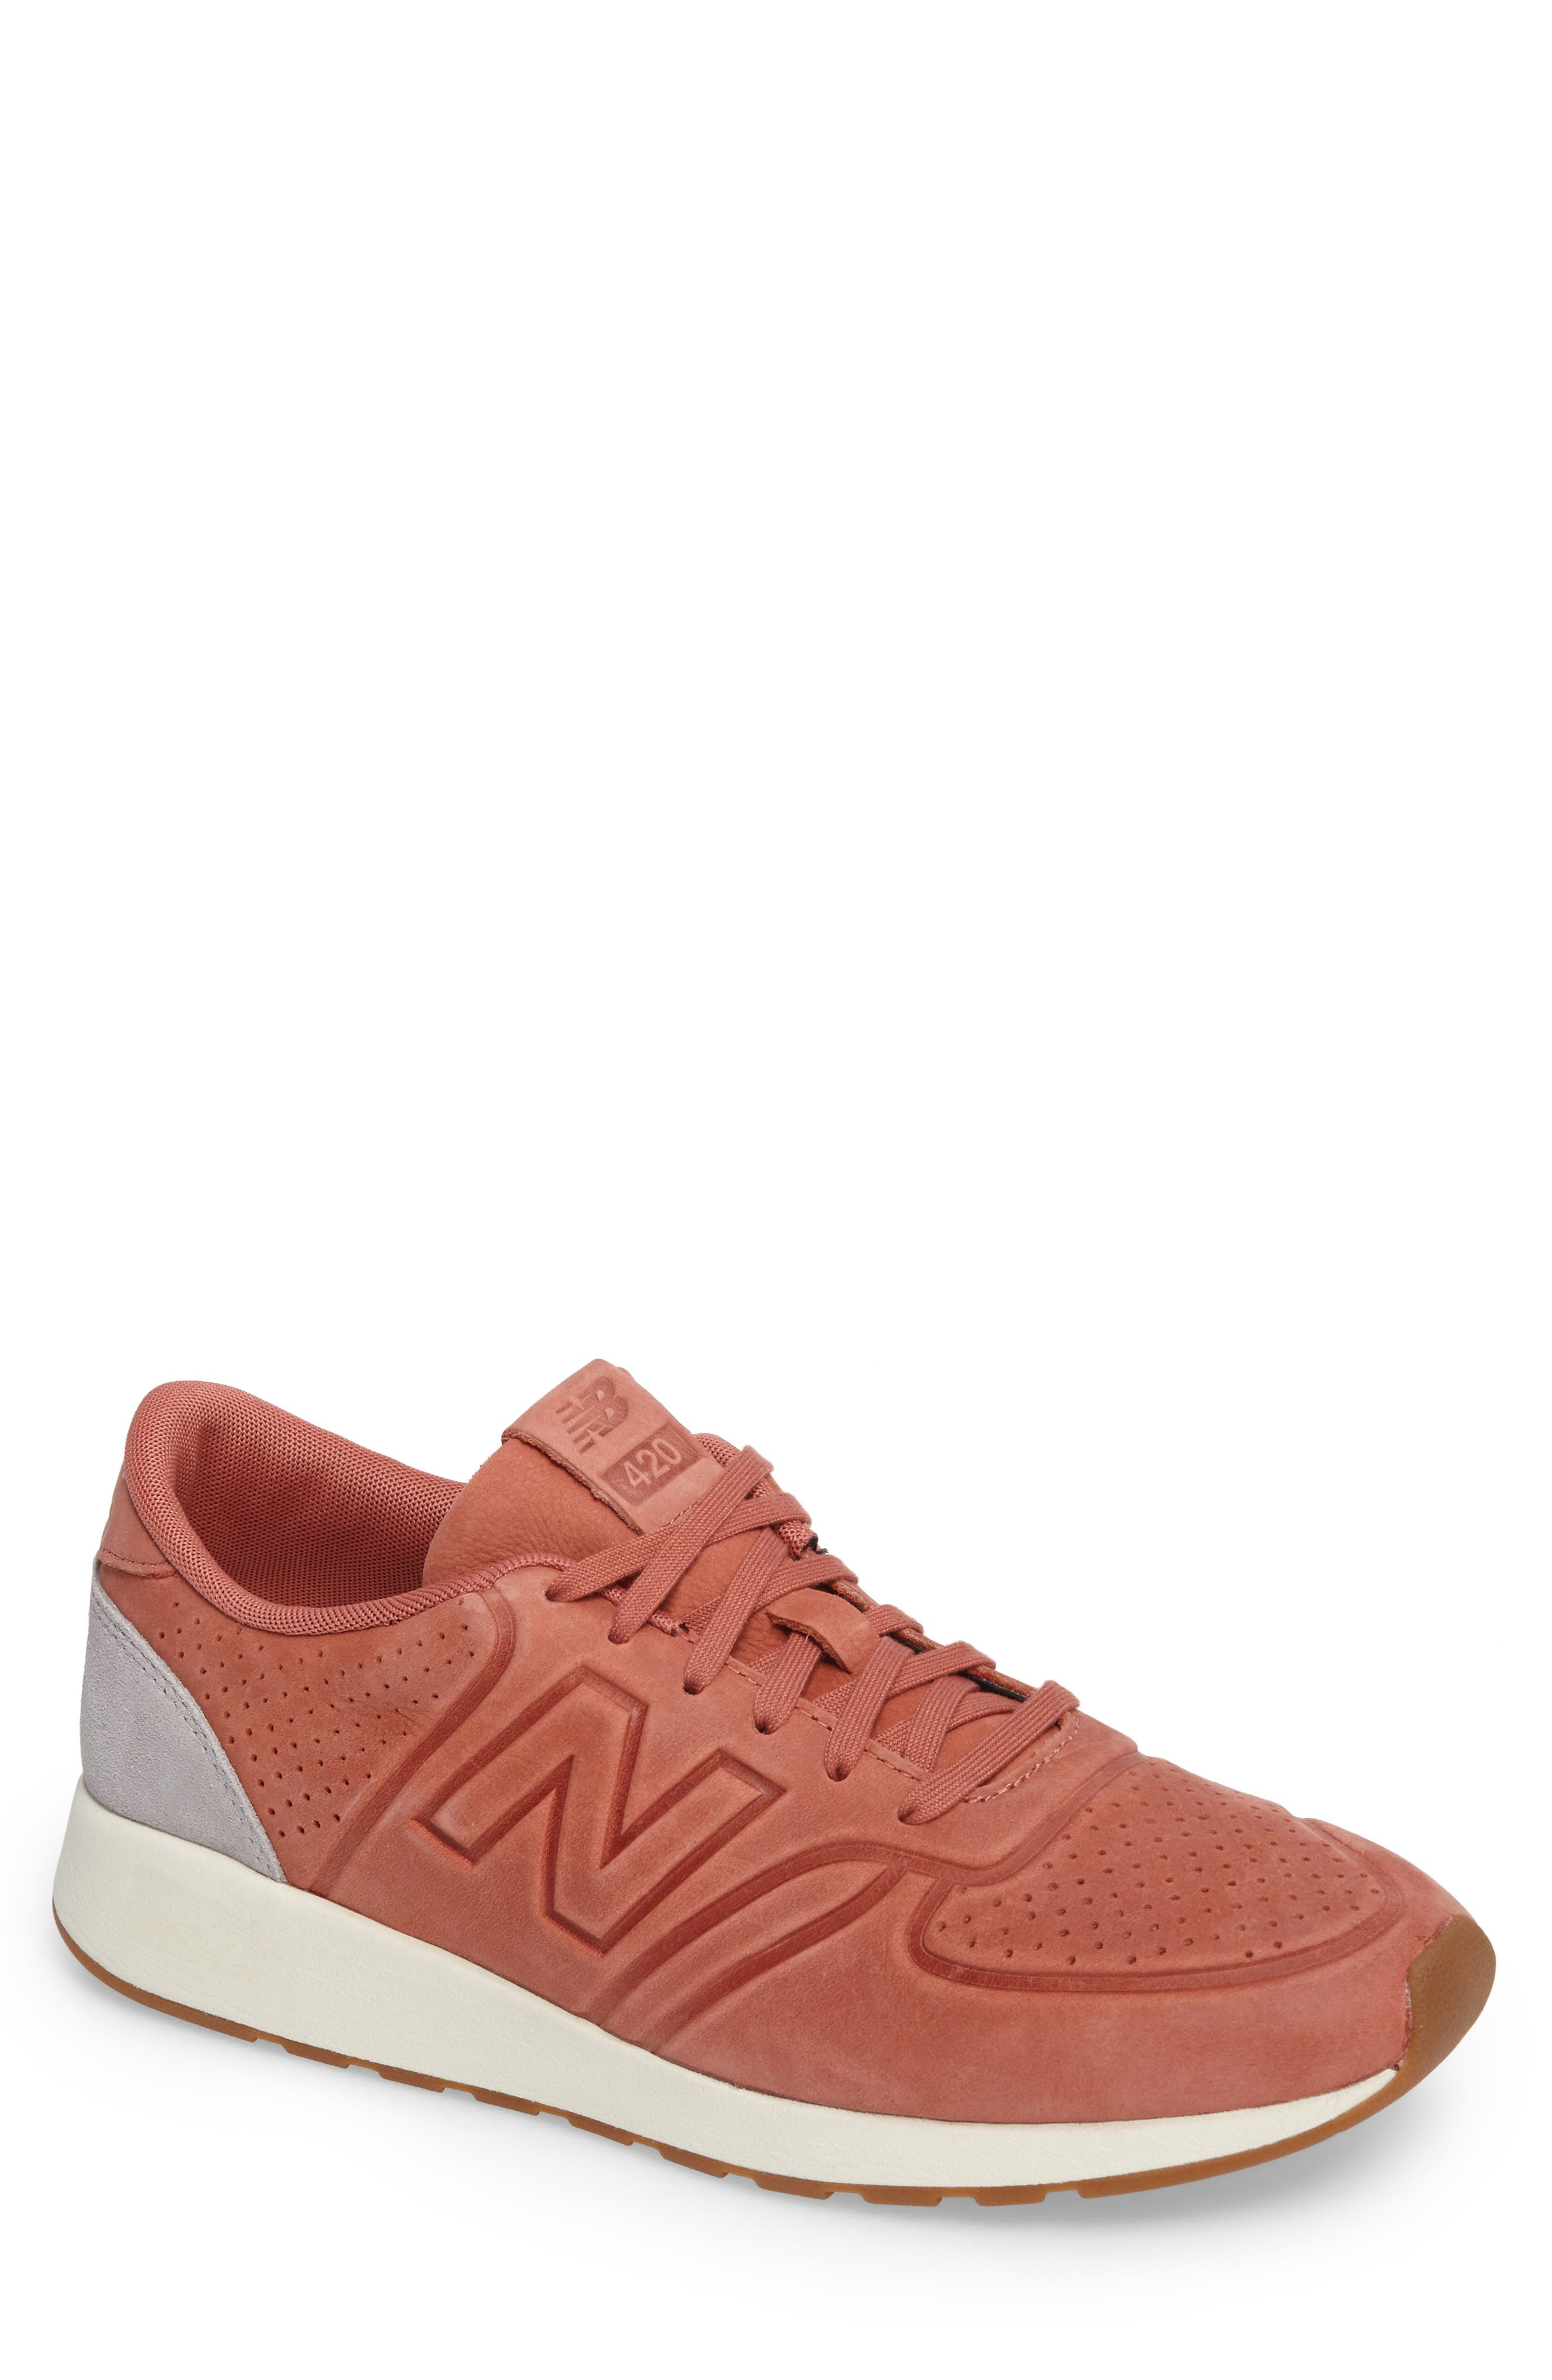 Main Image - New Balance 420 Premium Decon Sneaker (Men)